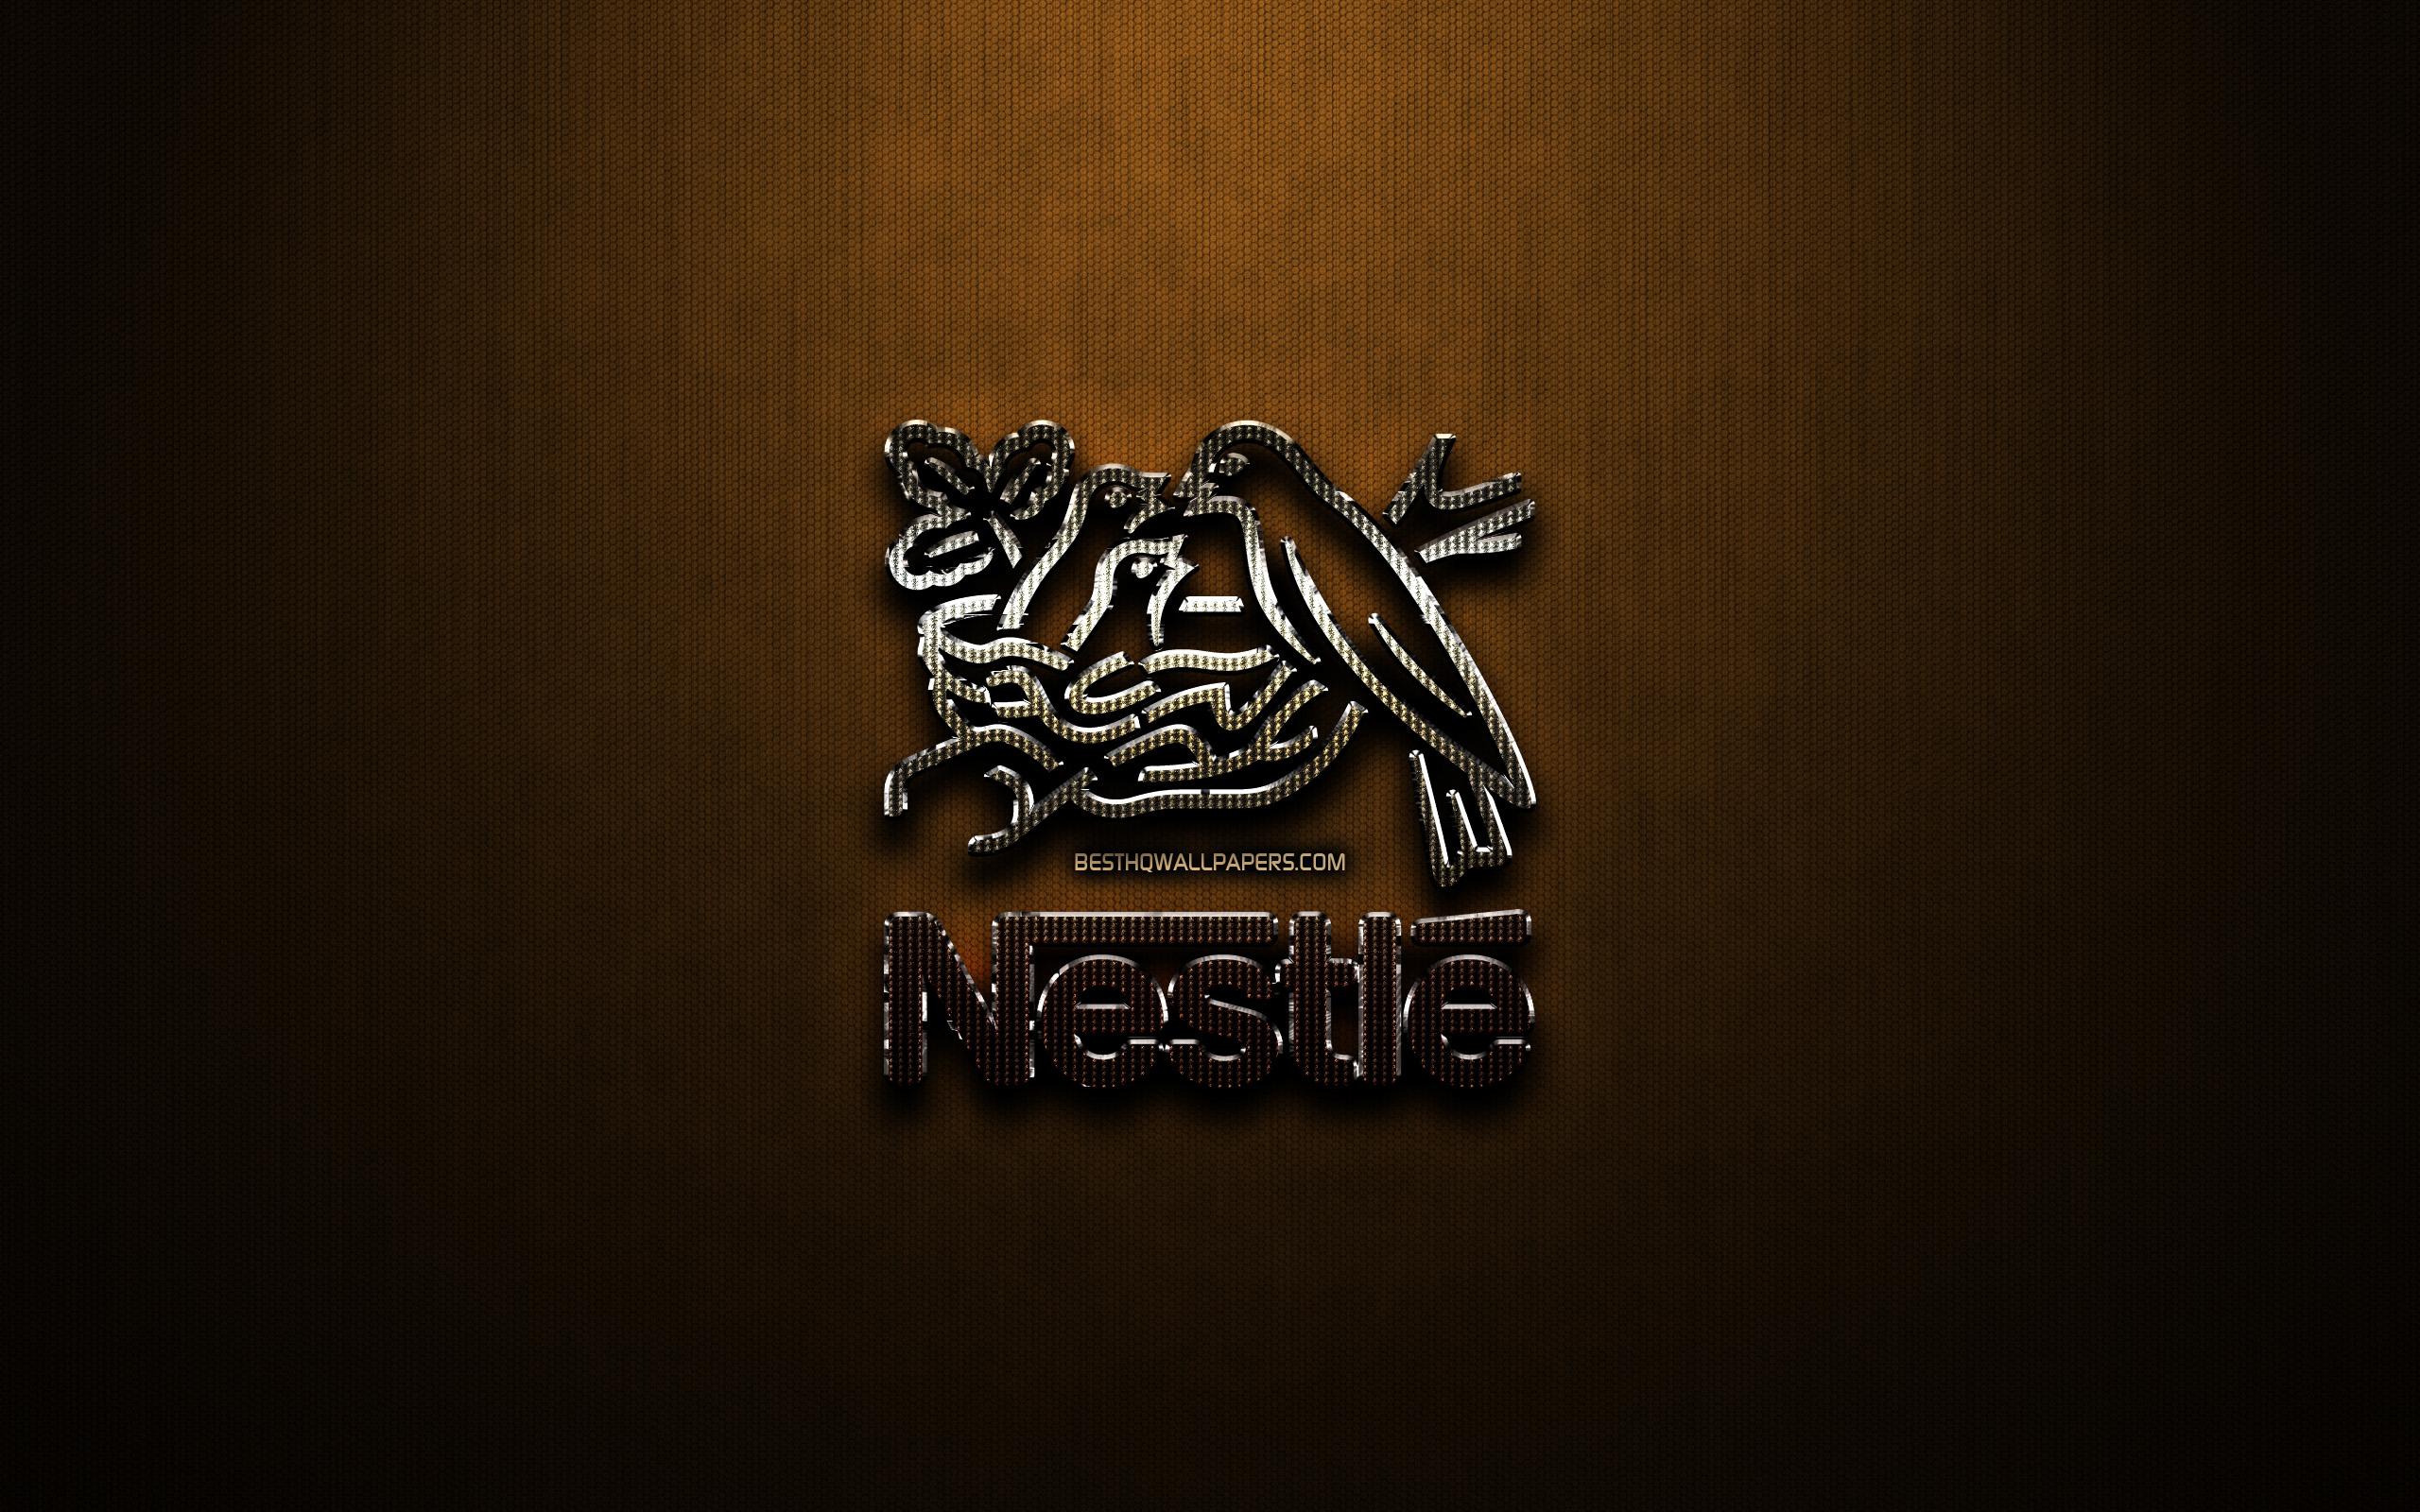 Download wallpapers Nestle glitter logo creative bronze metal 2560x1600